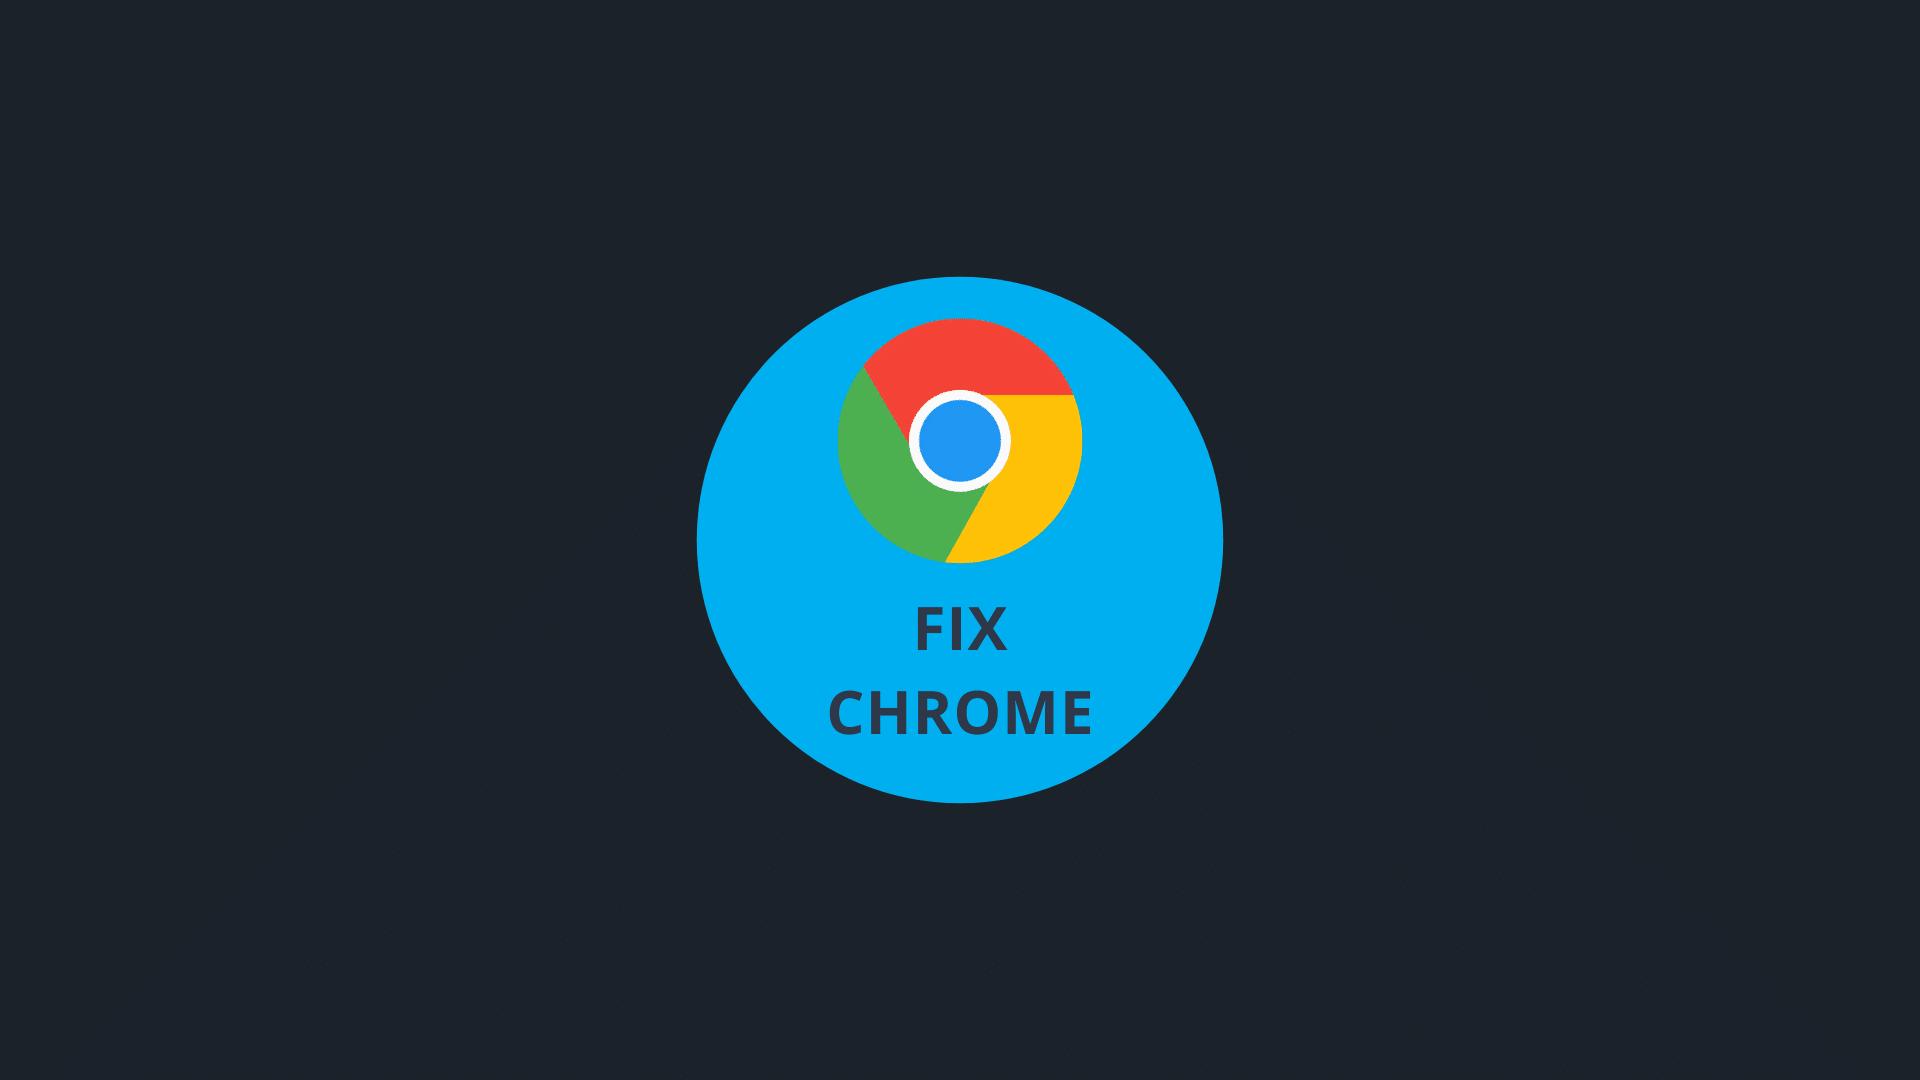 fix chrome